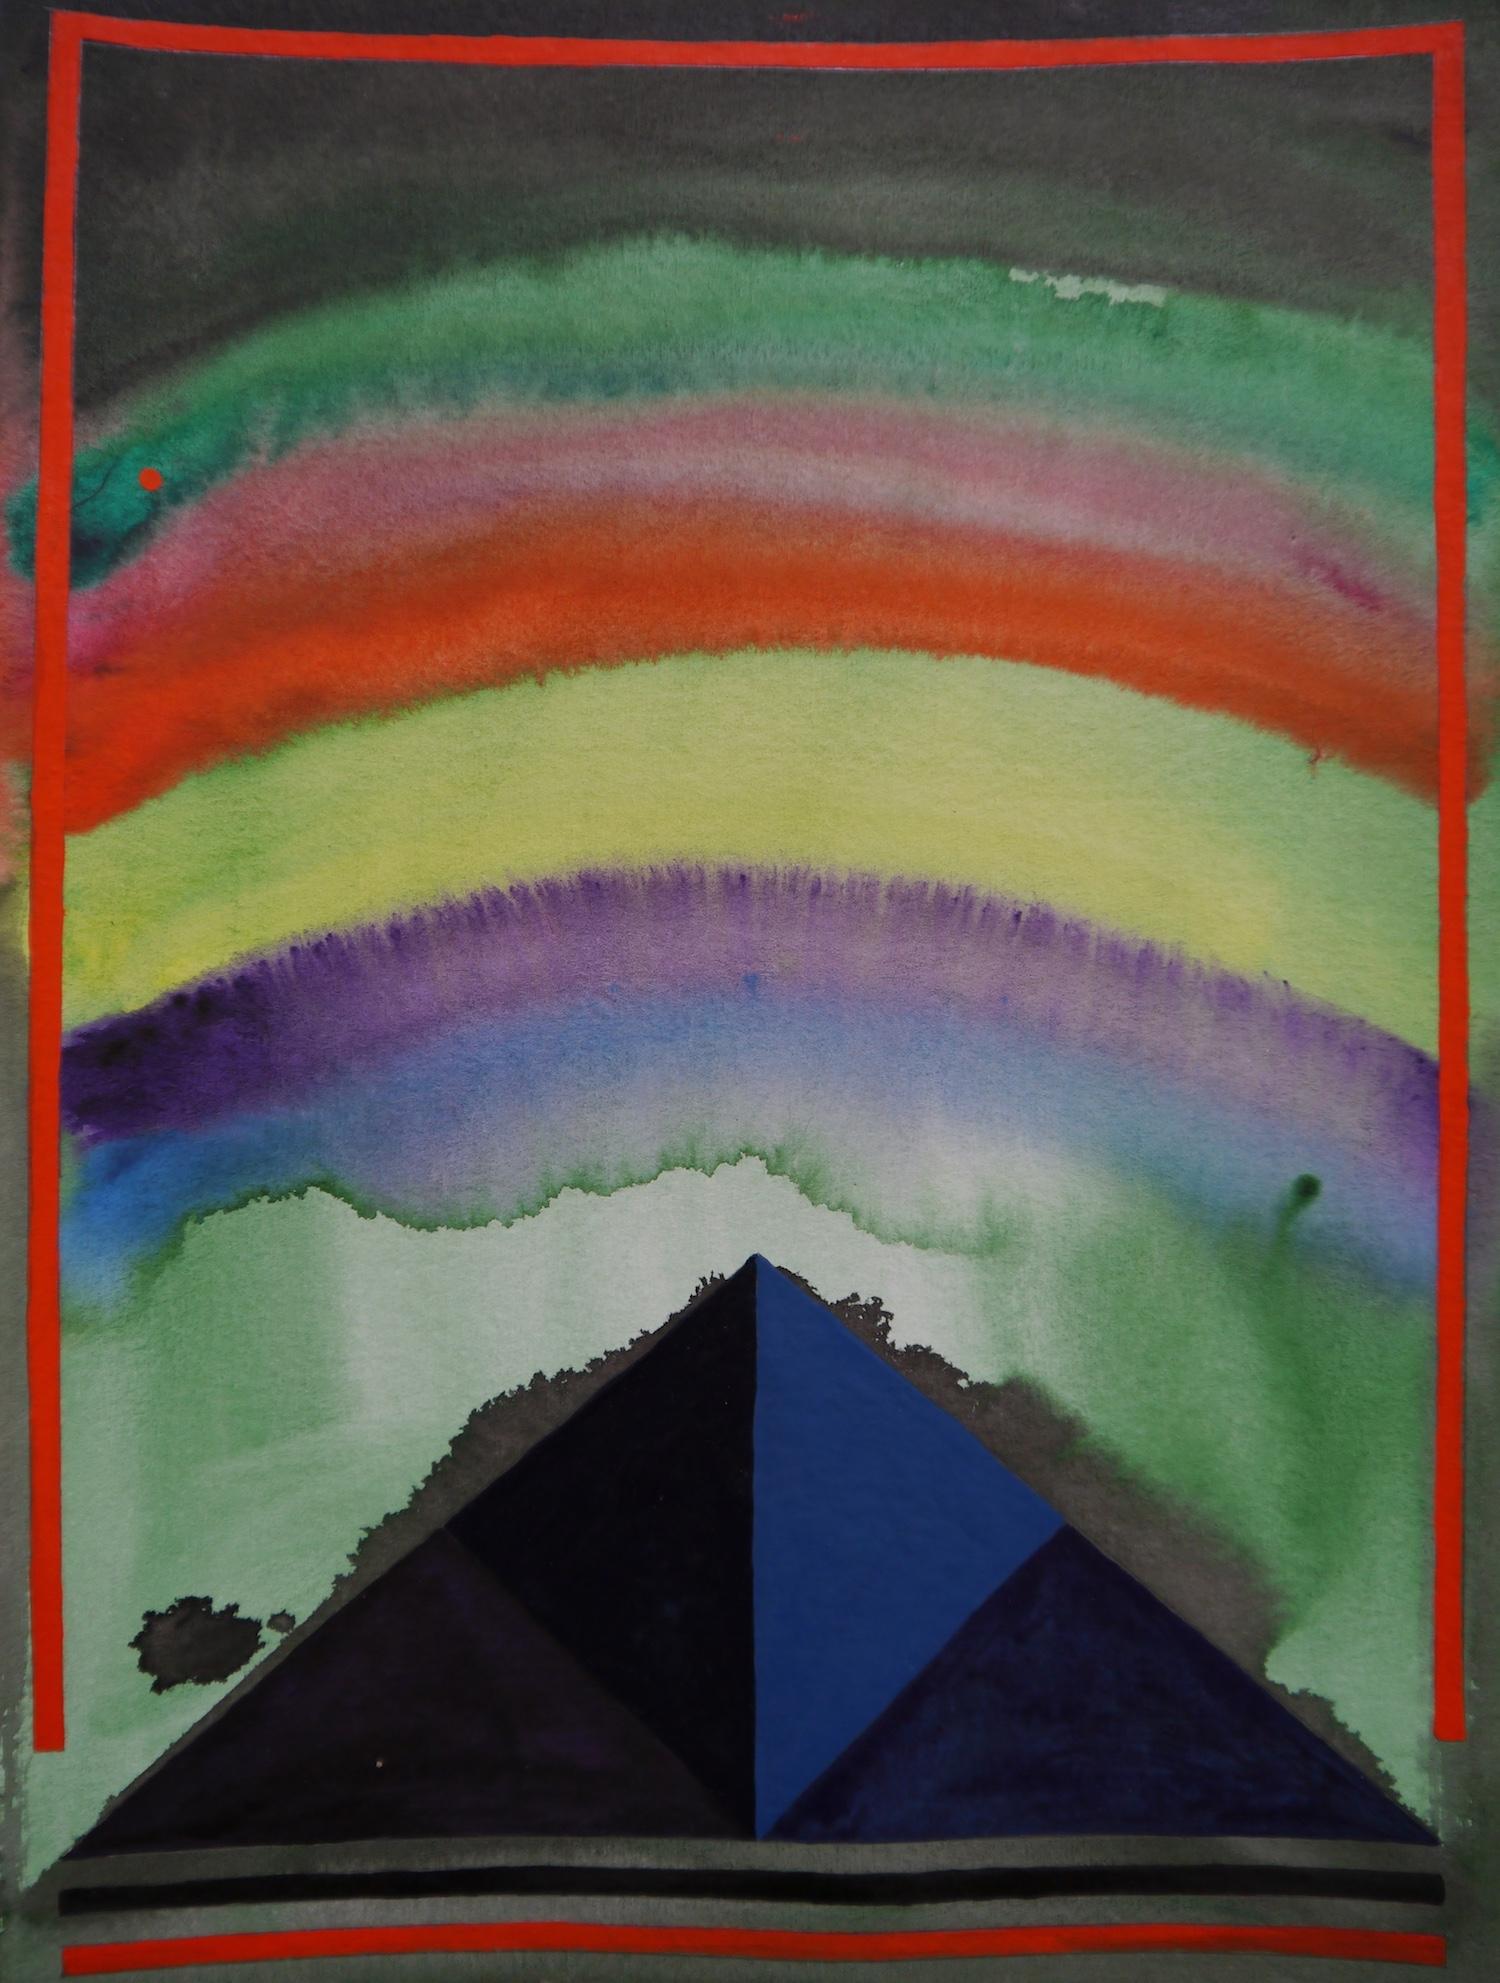 painting art space watercolor geometry geometrie aquarell cosmos cosmic malerei universe universum formen colorful silence aesthetic  kunst pyramids rainbow